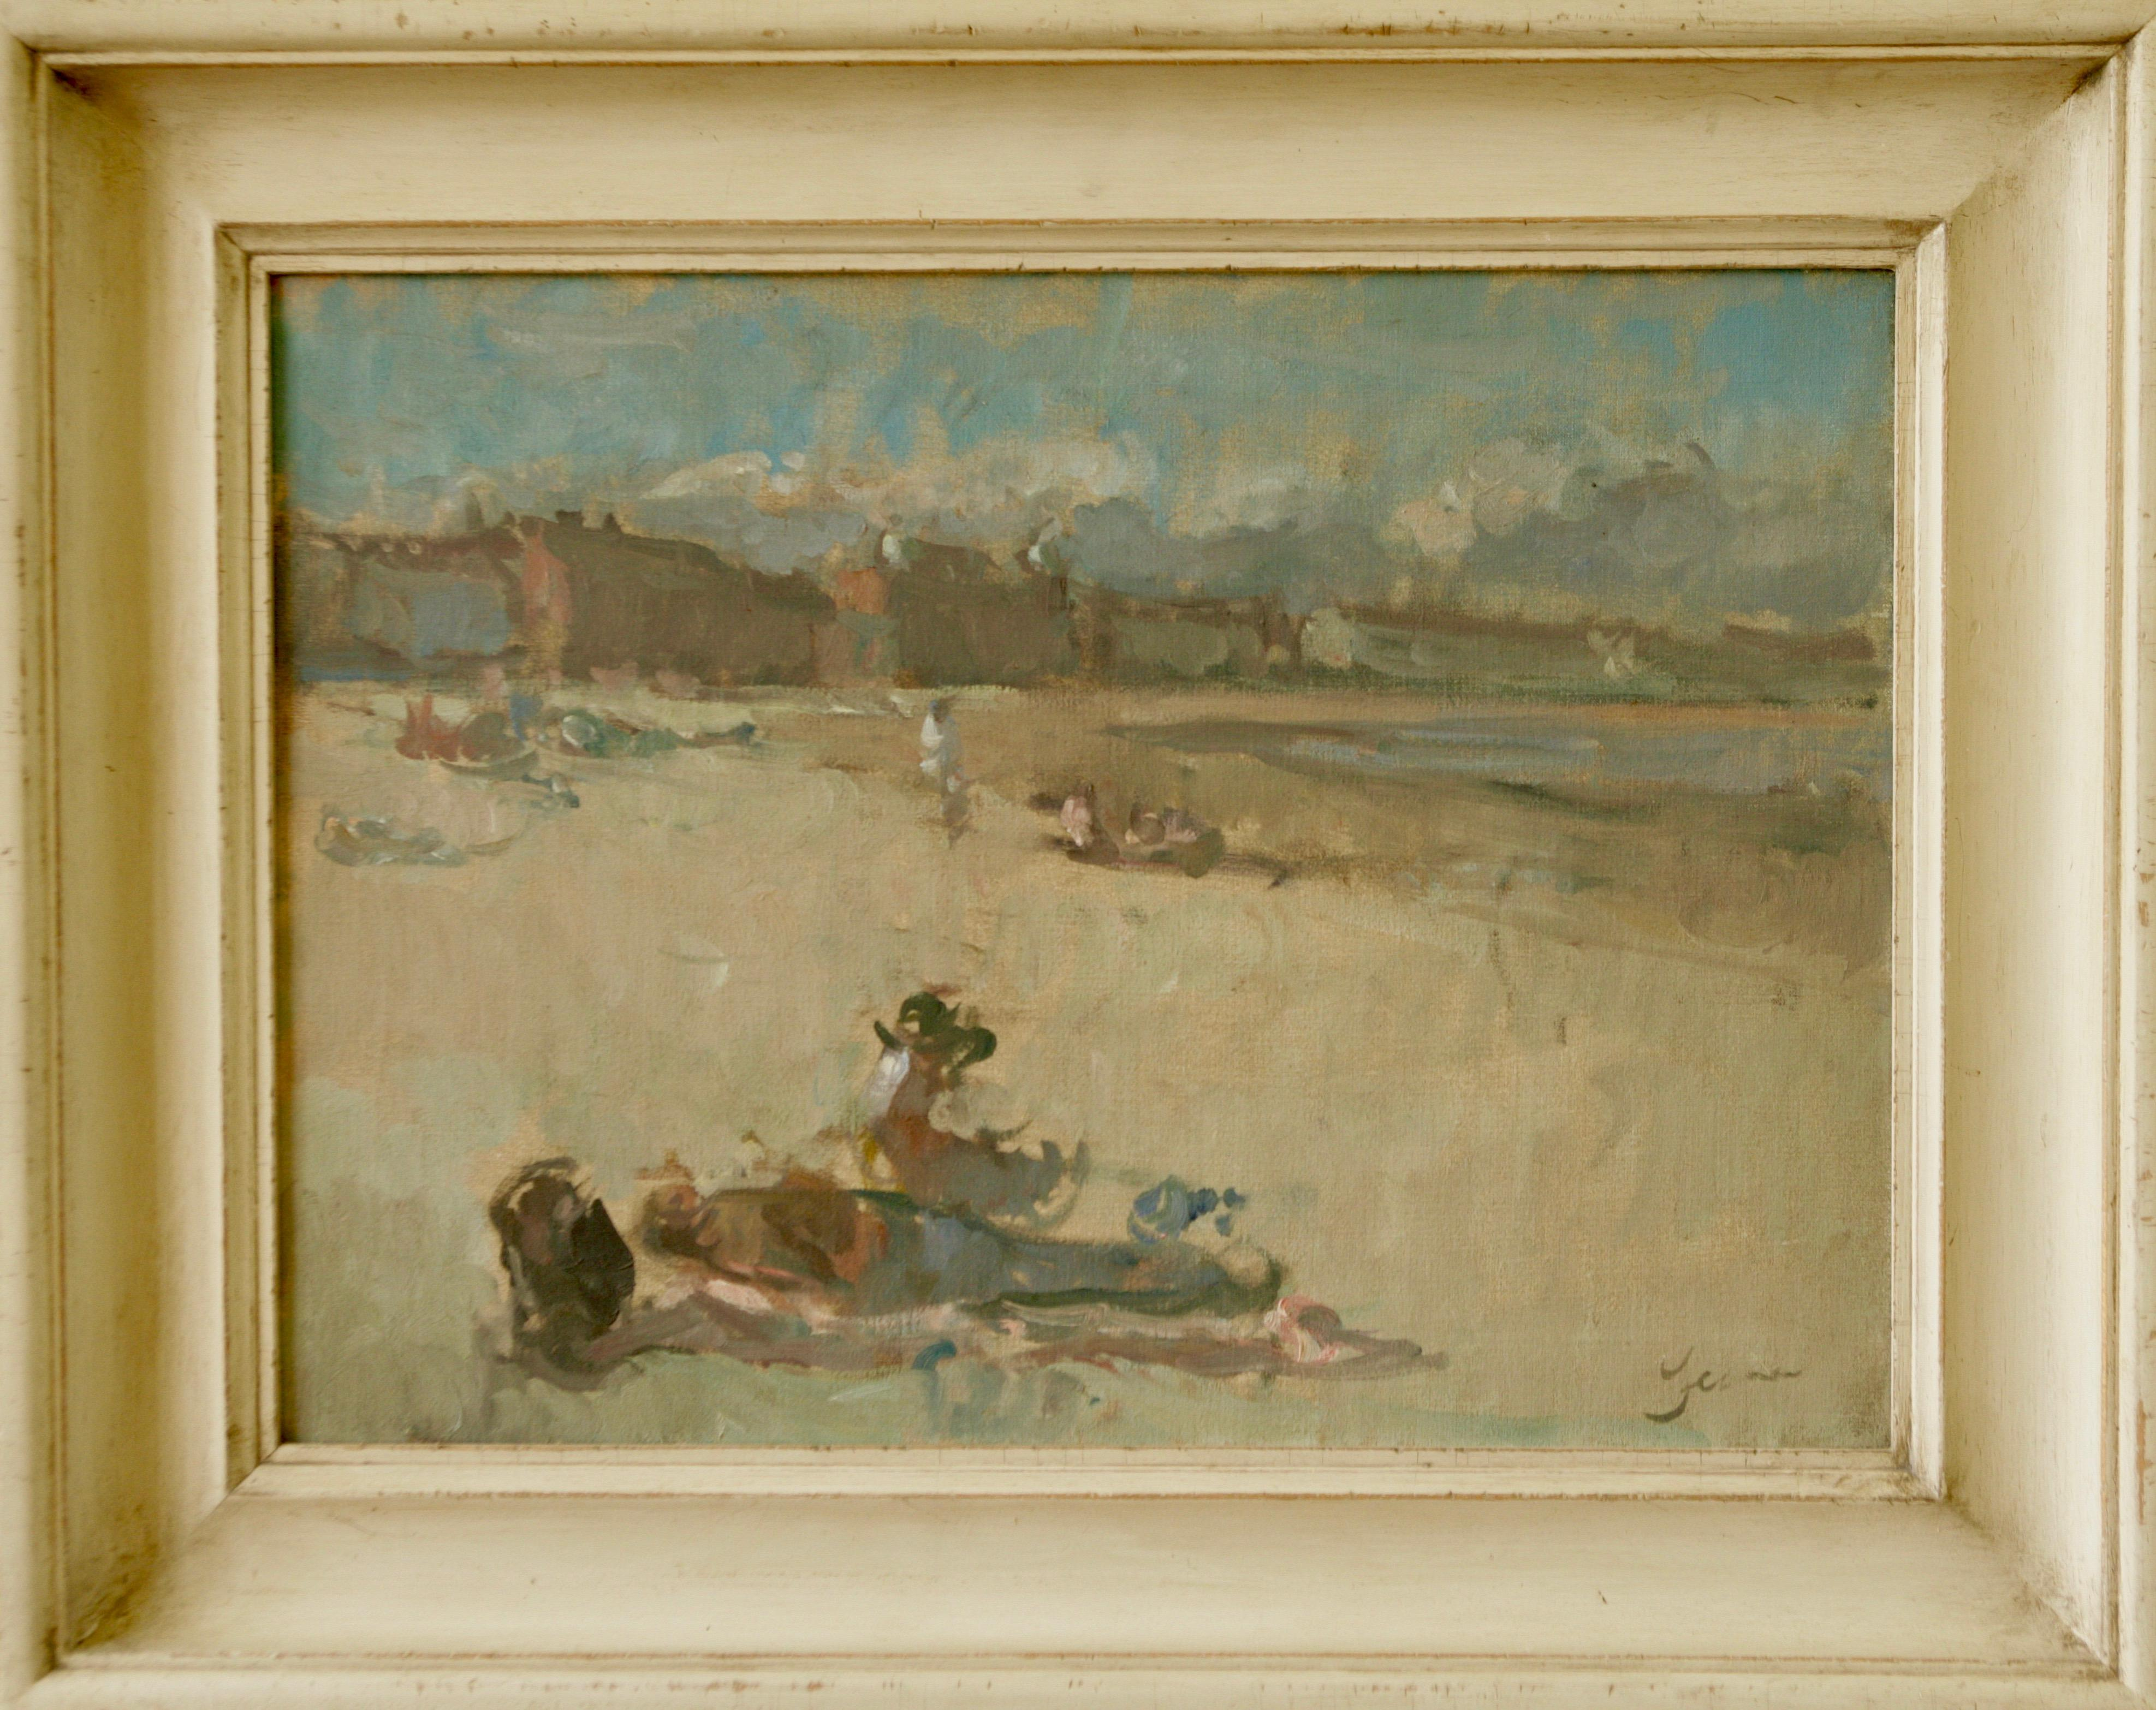 HOLIDAY BEACH WEYMOUTH.Martin Yeoman NEAC.RP contemporary British artist